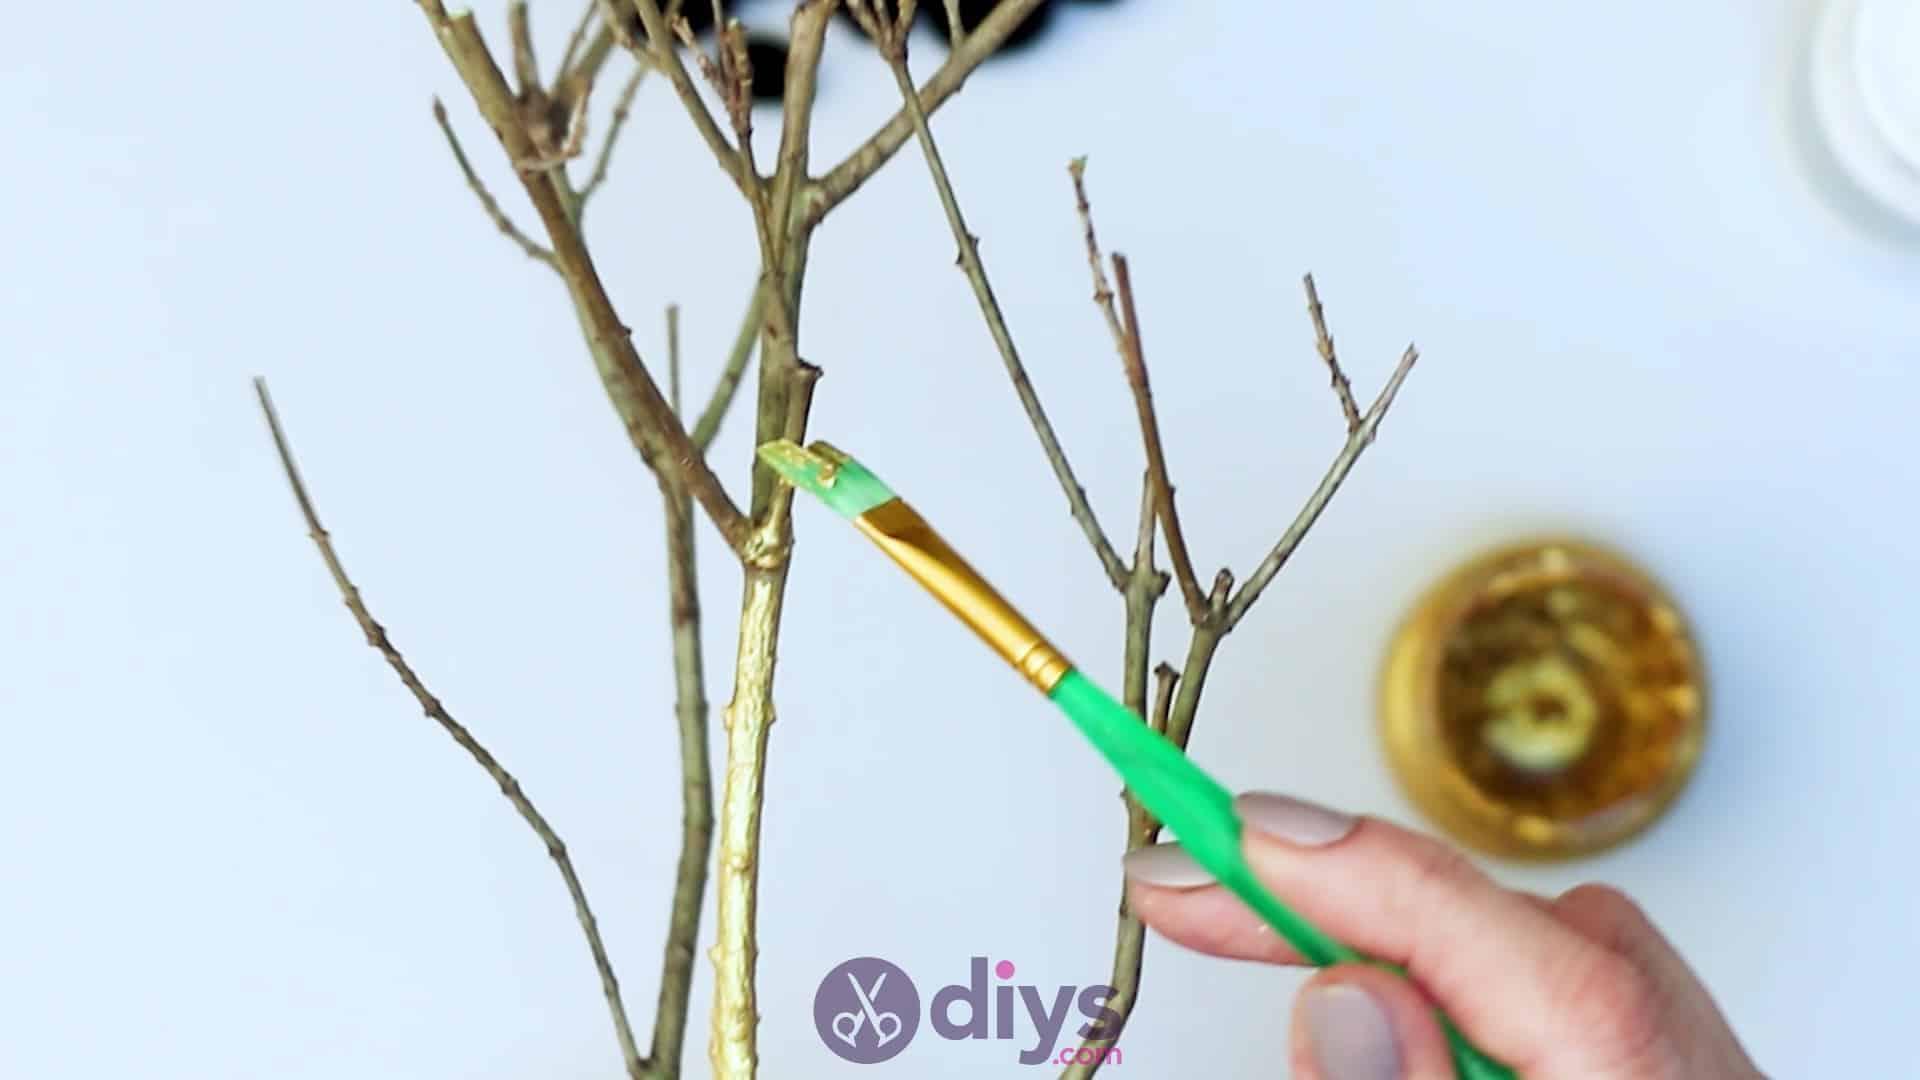 Diy pom pom tree art step 3b